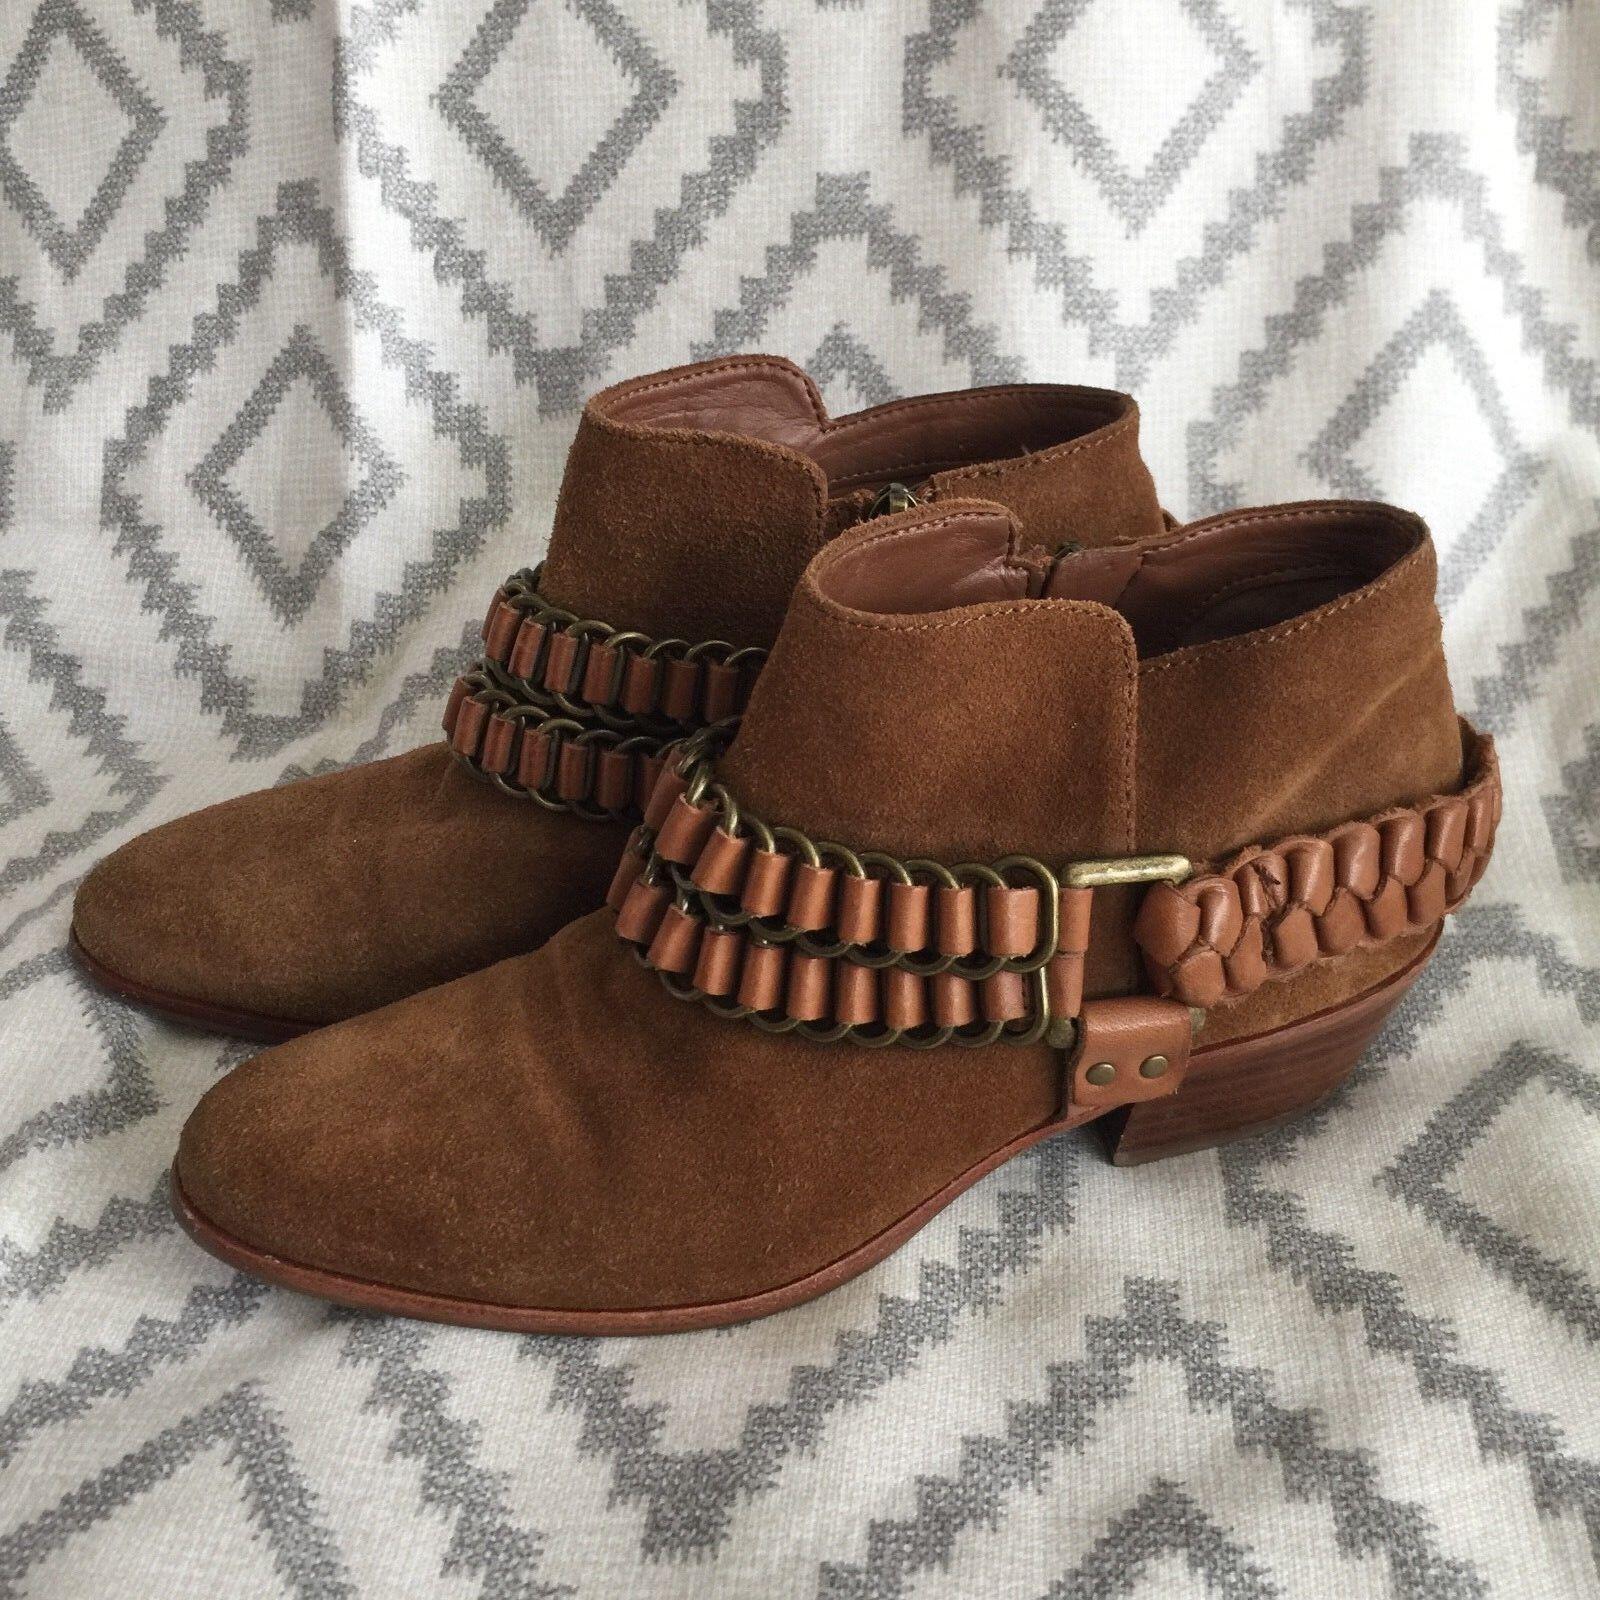 Sam Edelman Women's Posey Whiskey Saddle Suede Chain Strap Booties Size 6  z5